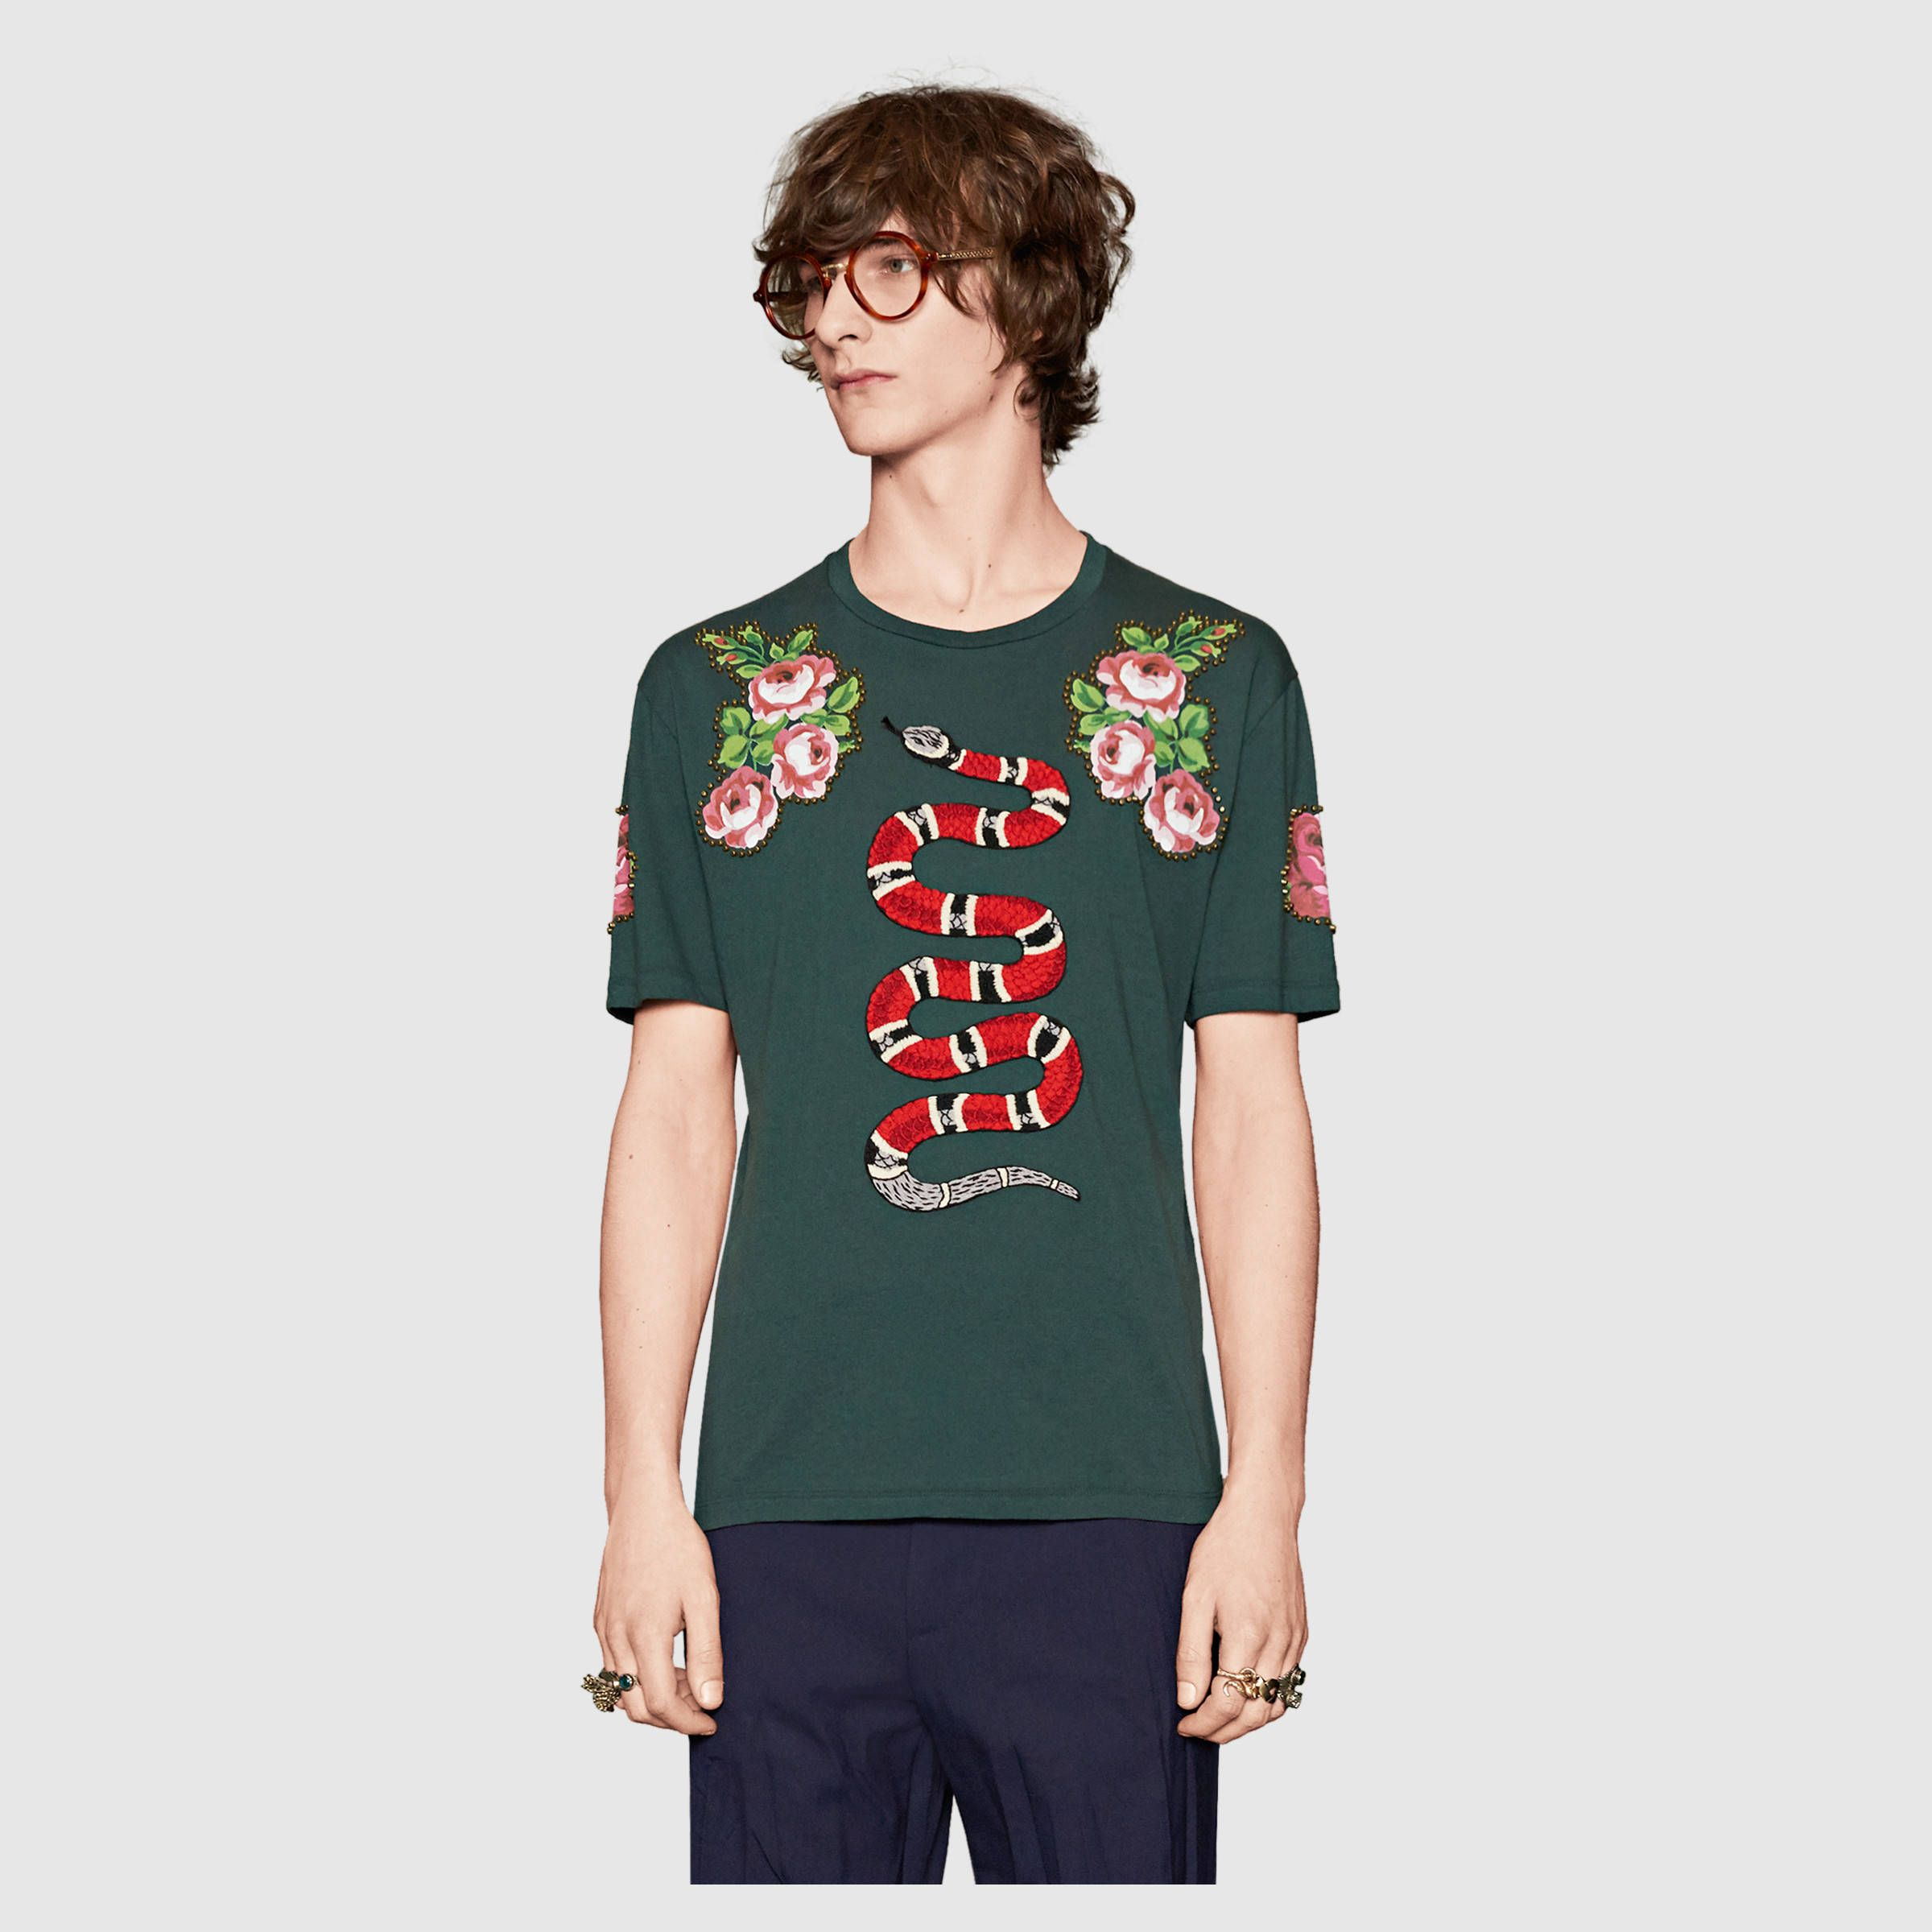 53c83fc6ba64a Sweat Shirt Gucci Homme